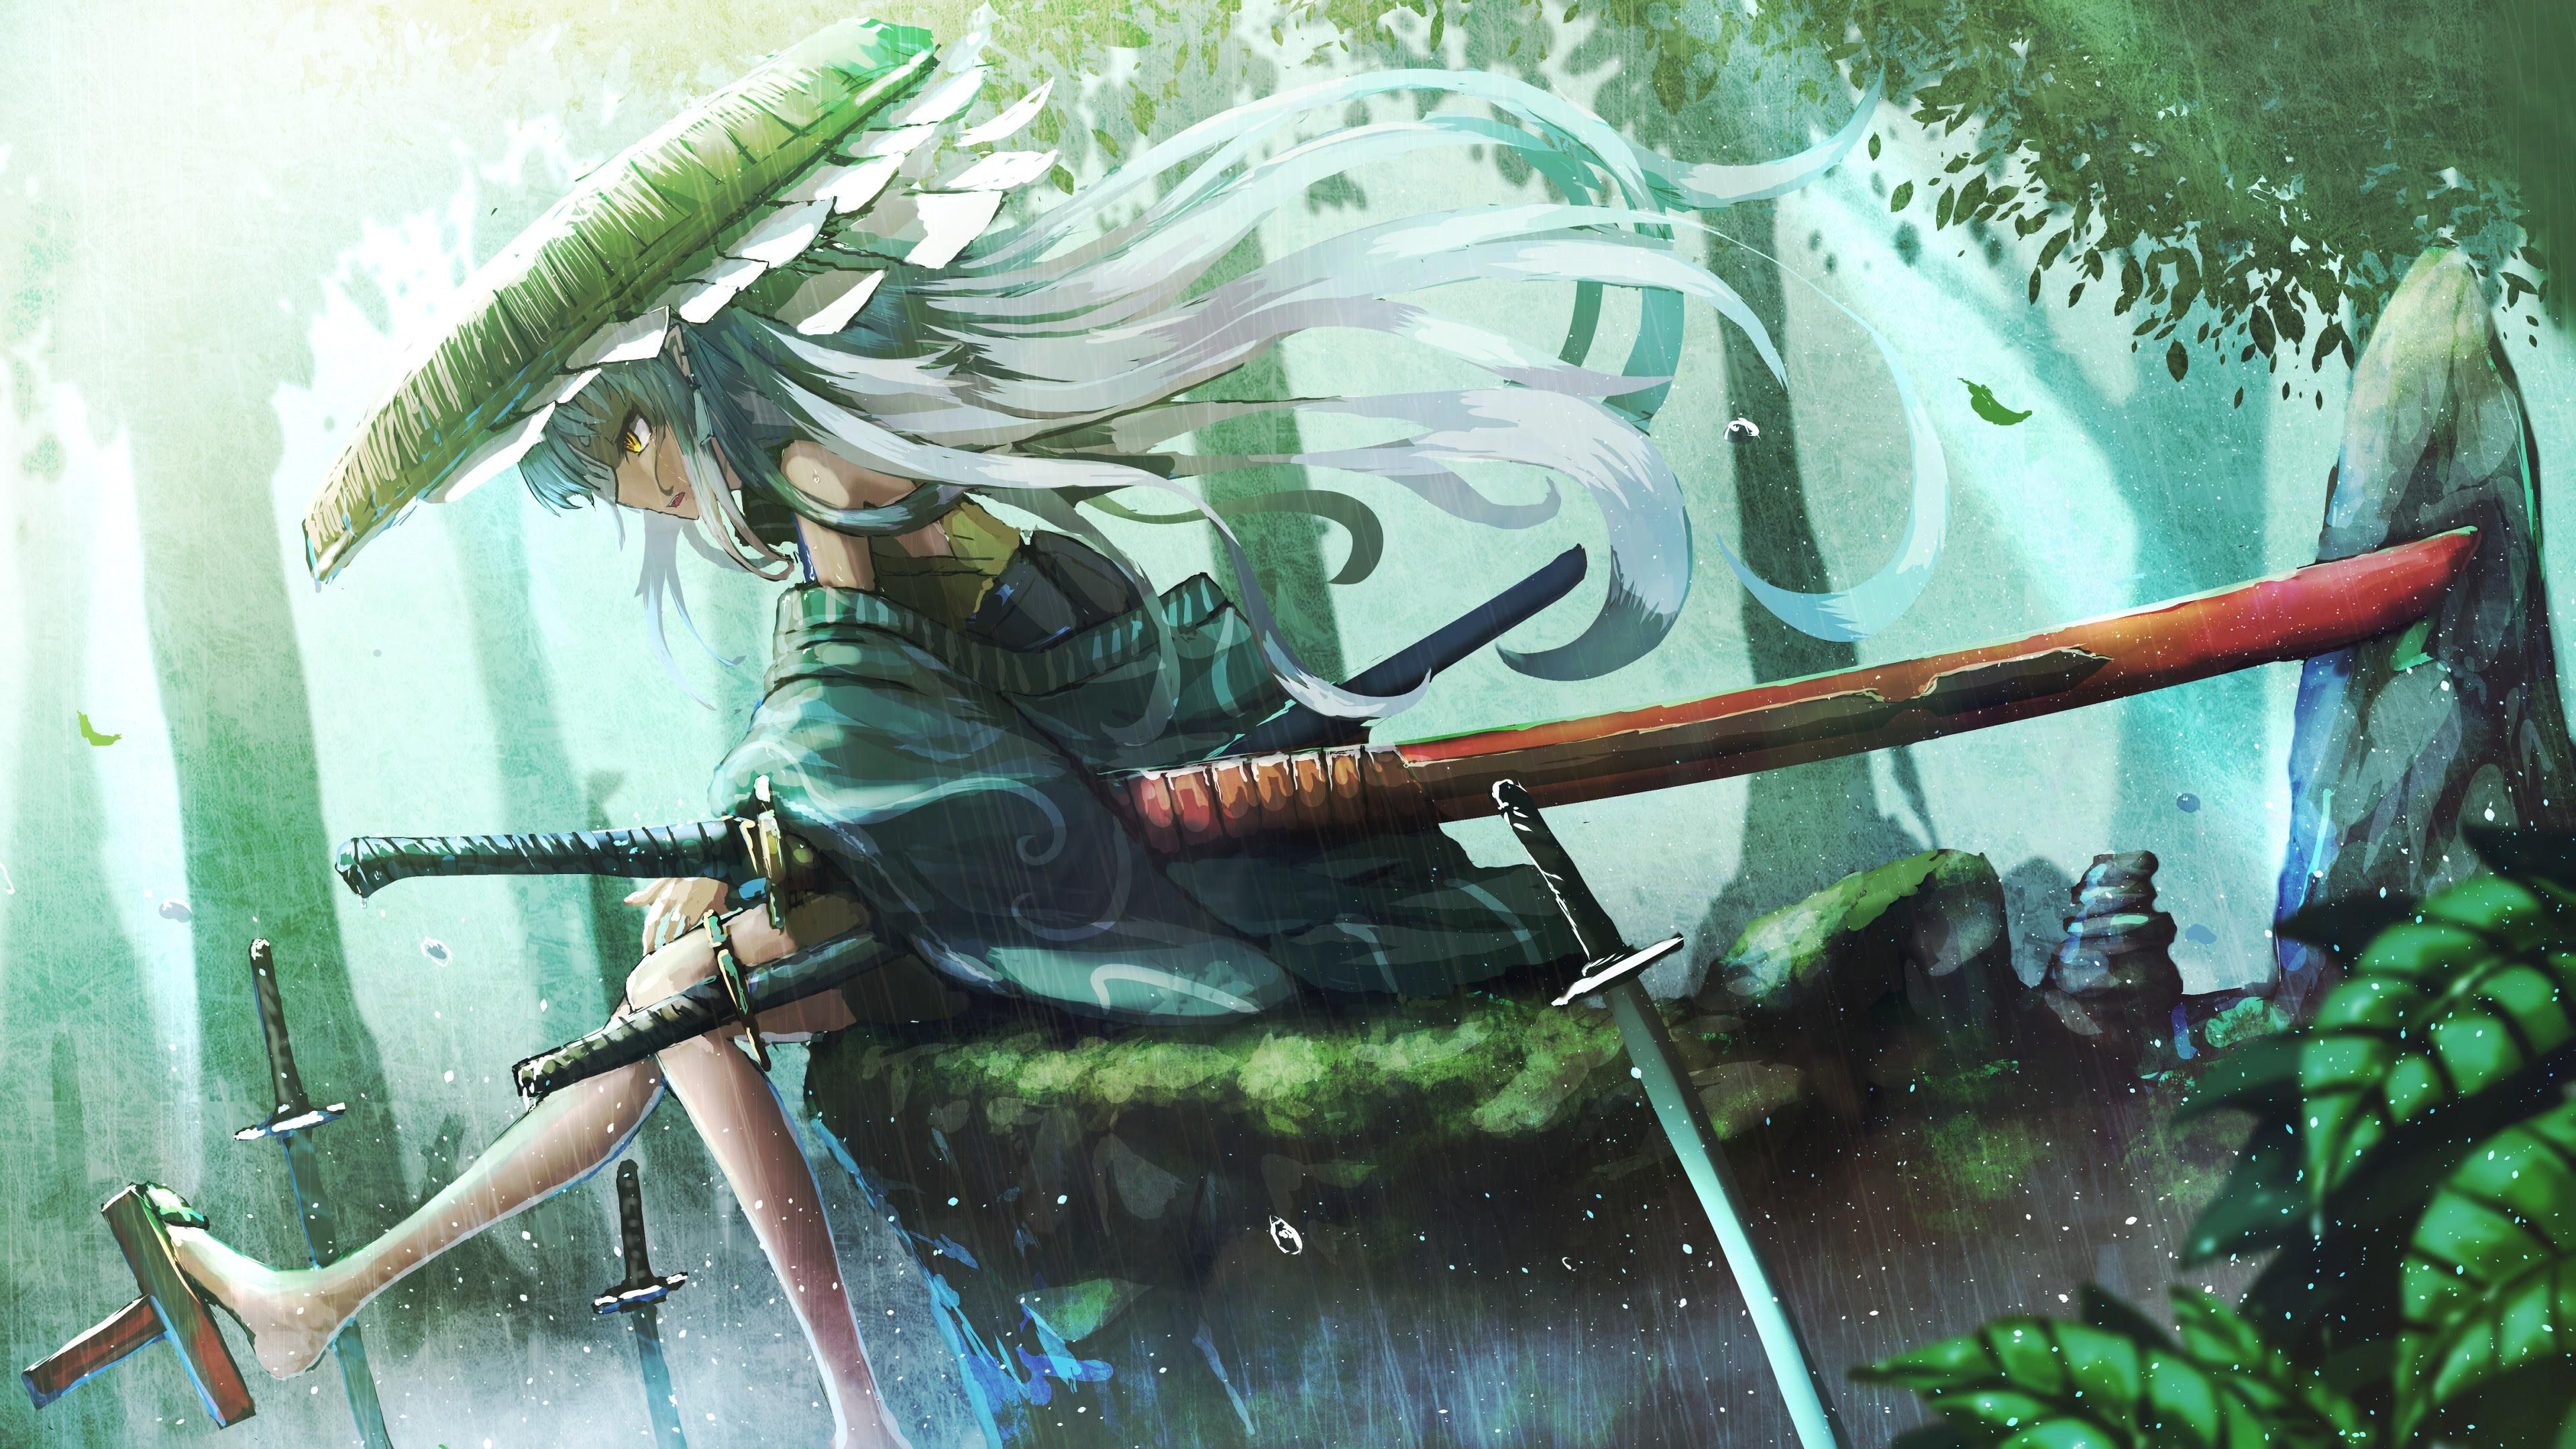 Samurai Girl Wallpaper Hd Anime Samurai Girl Katana 4k 91 Wallpaper